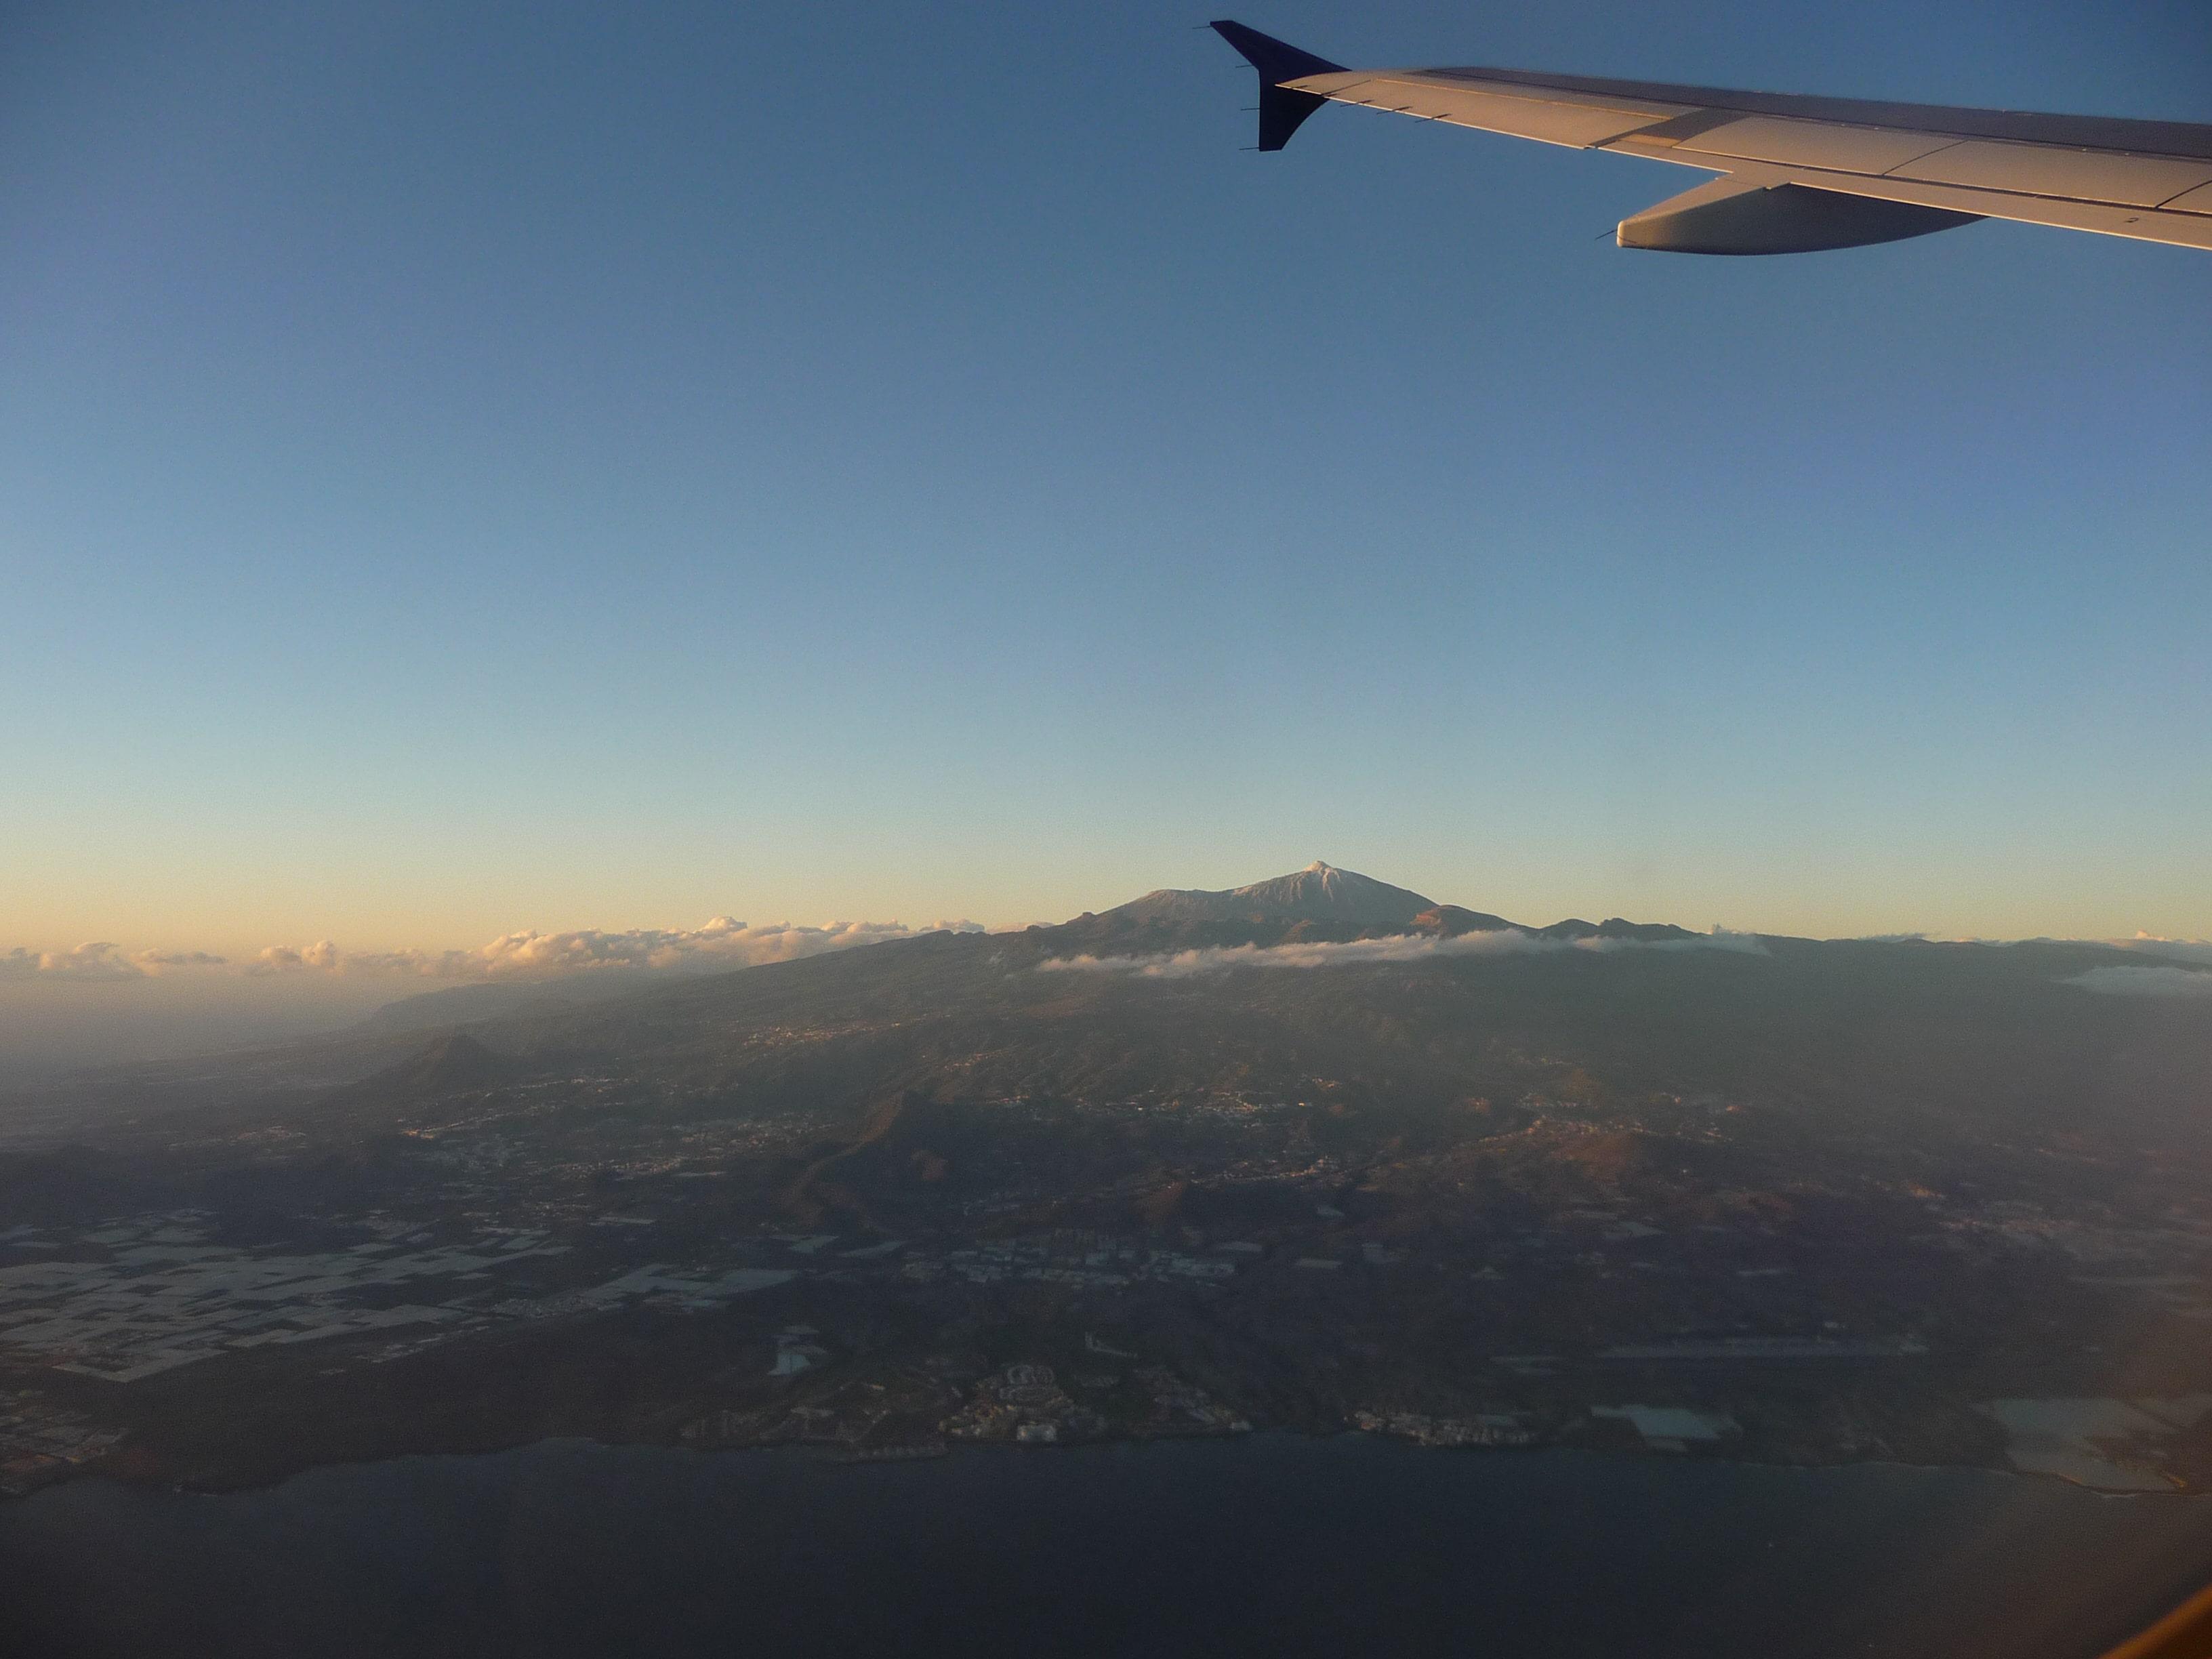 Teide_Teneriffa_Flugzeug